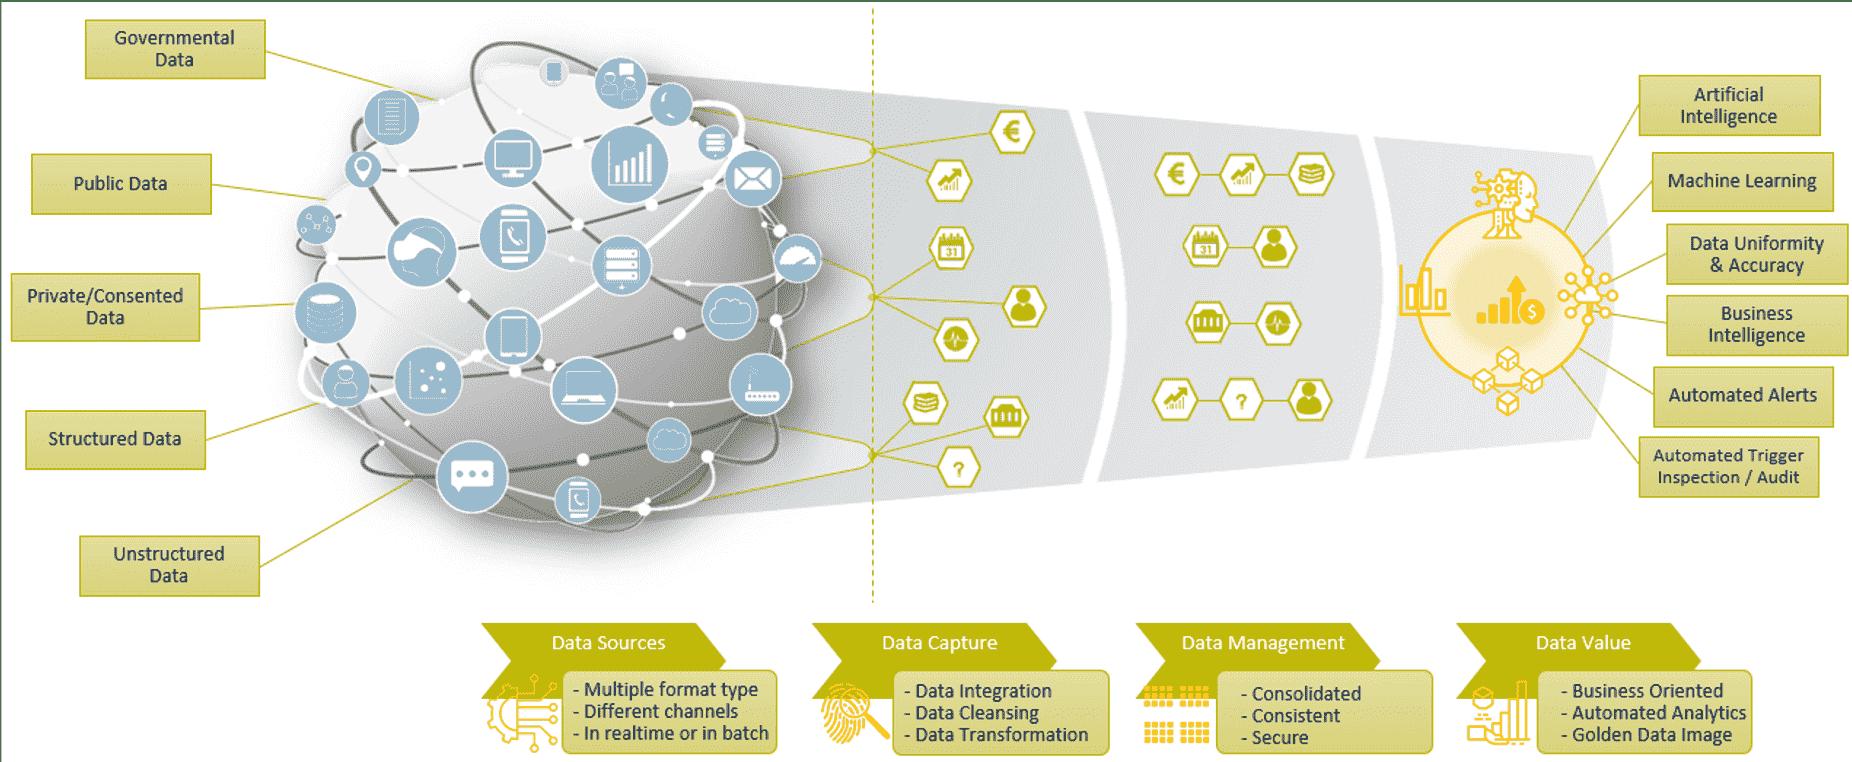 platform for controlling and regulating revenues